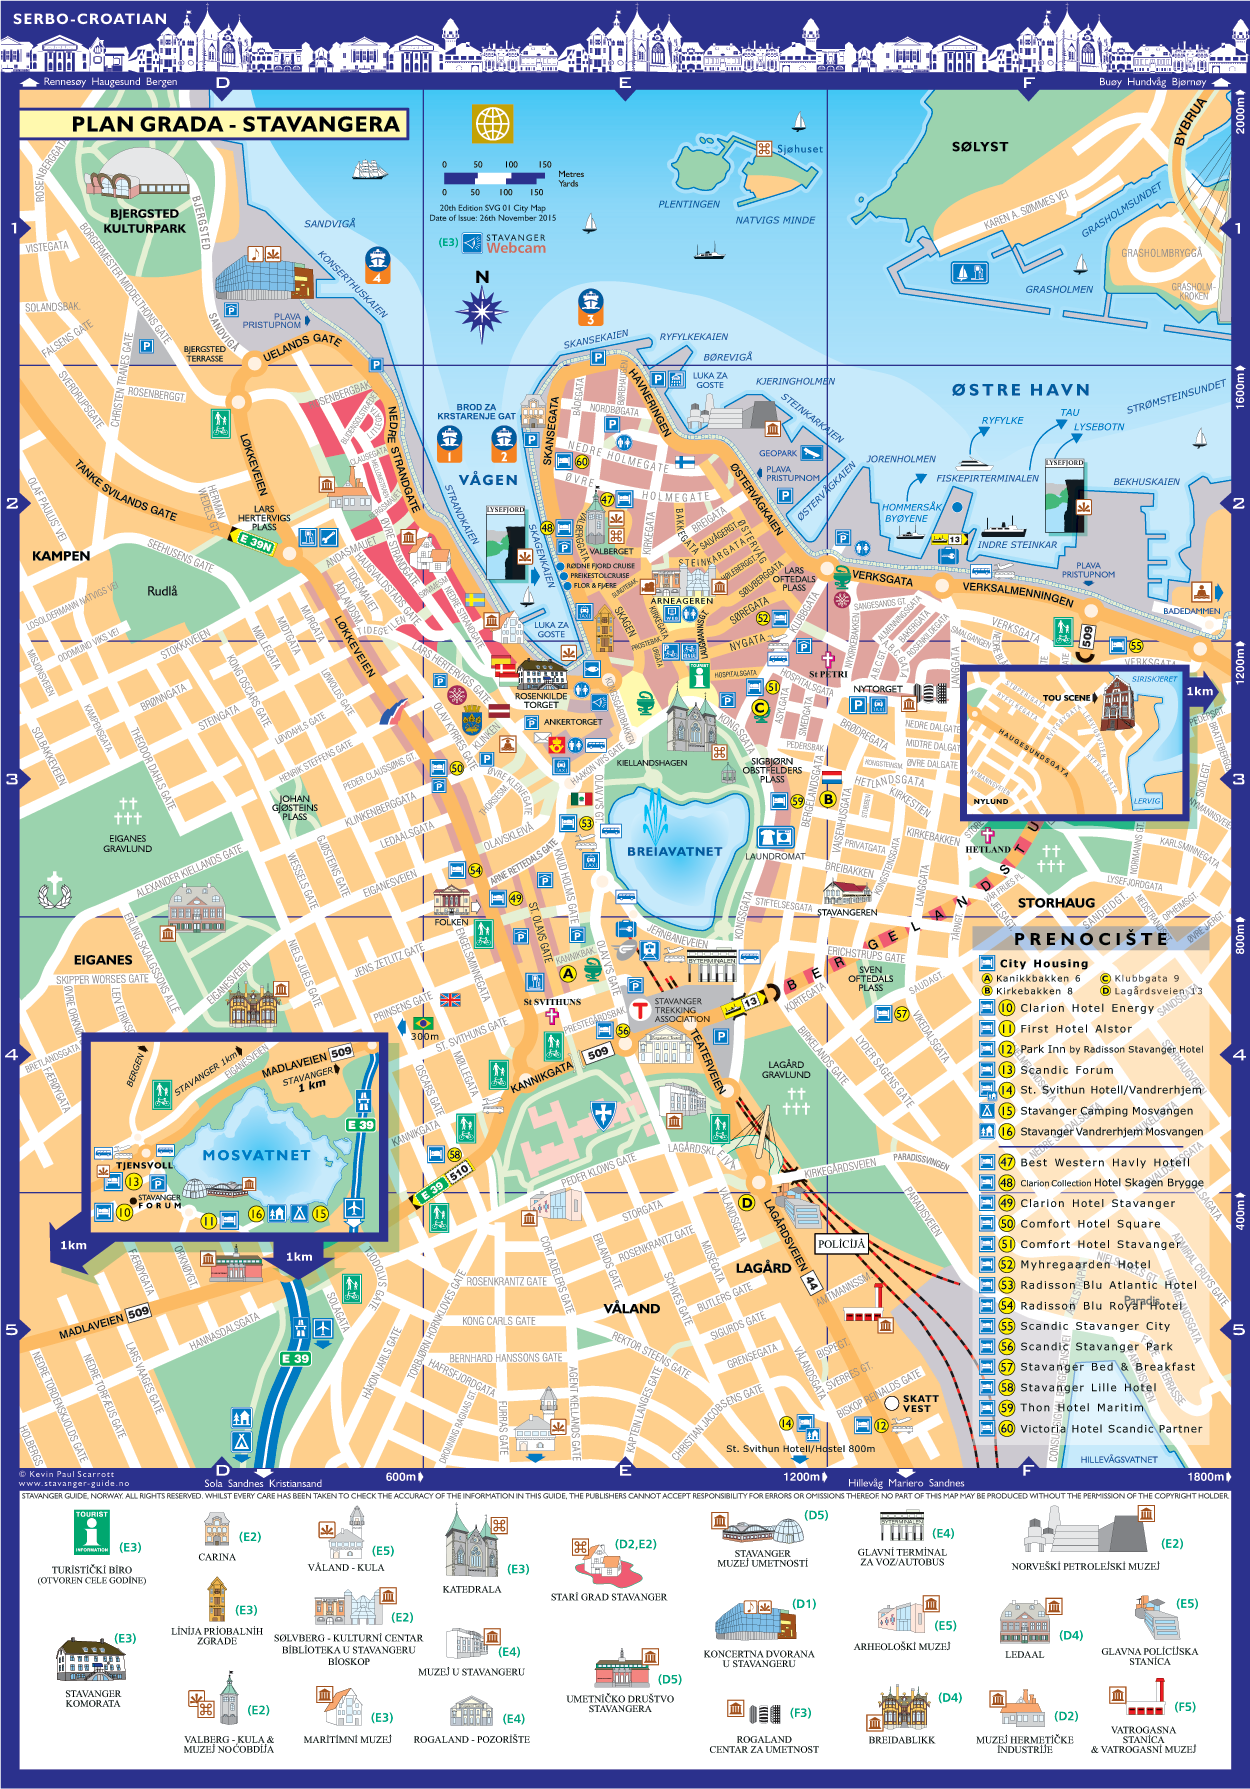 Stavanger Plan Grada